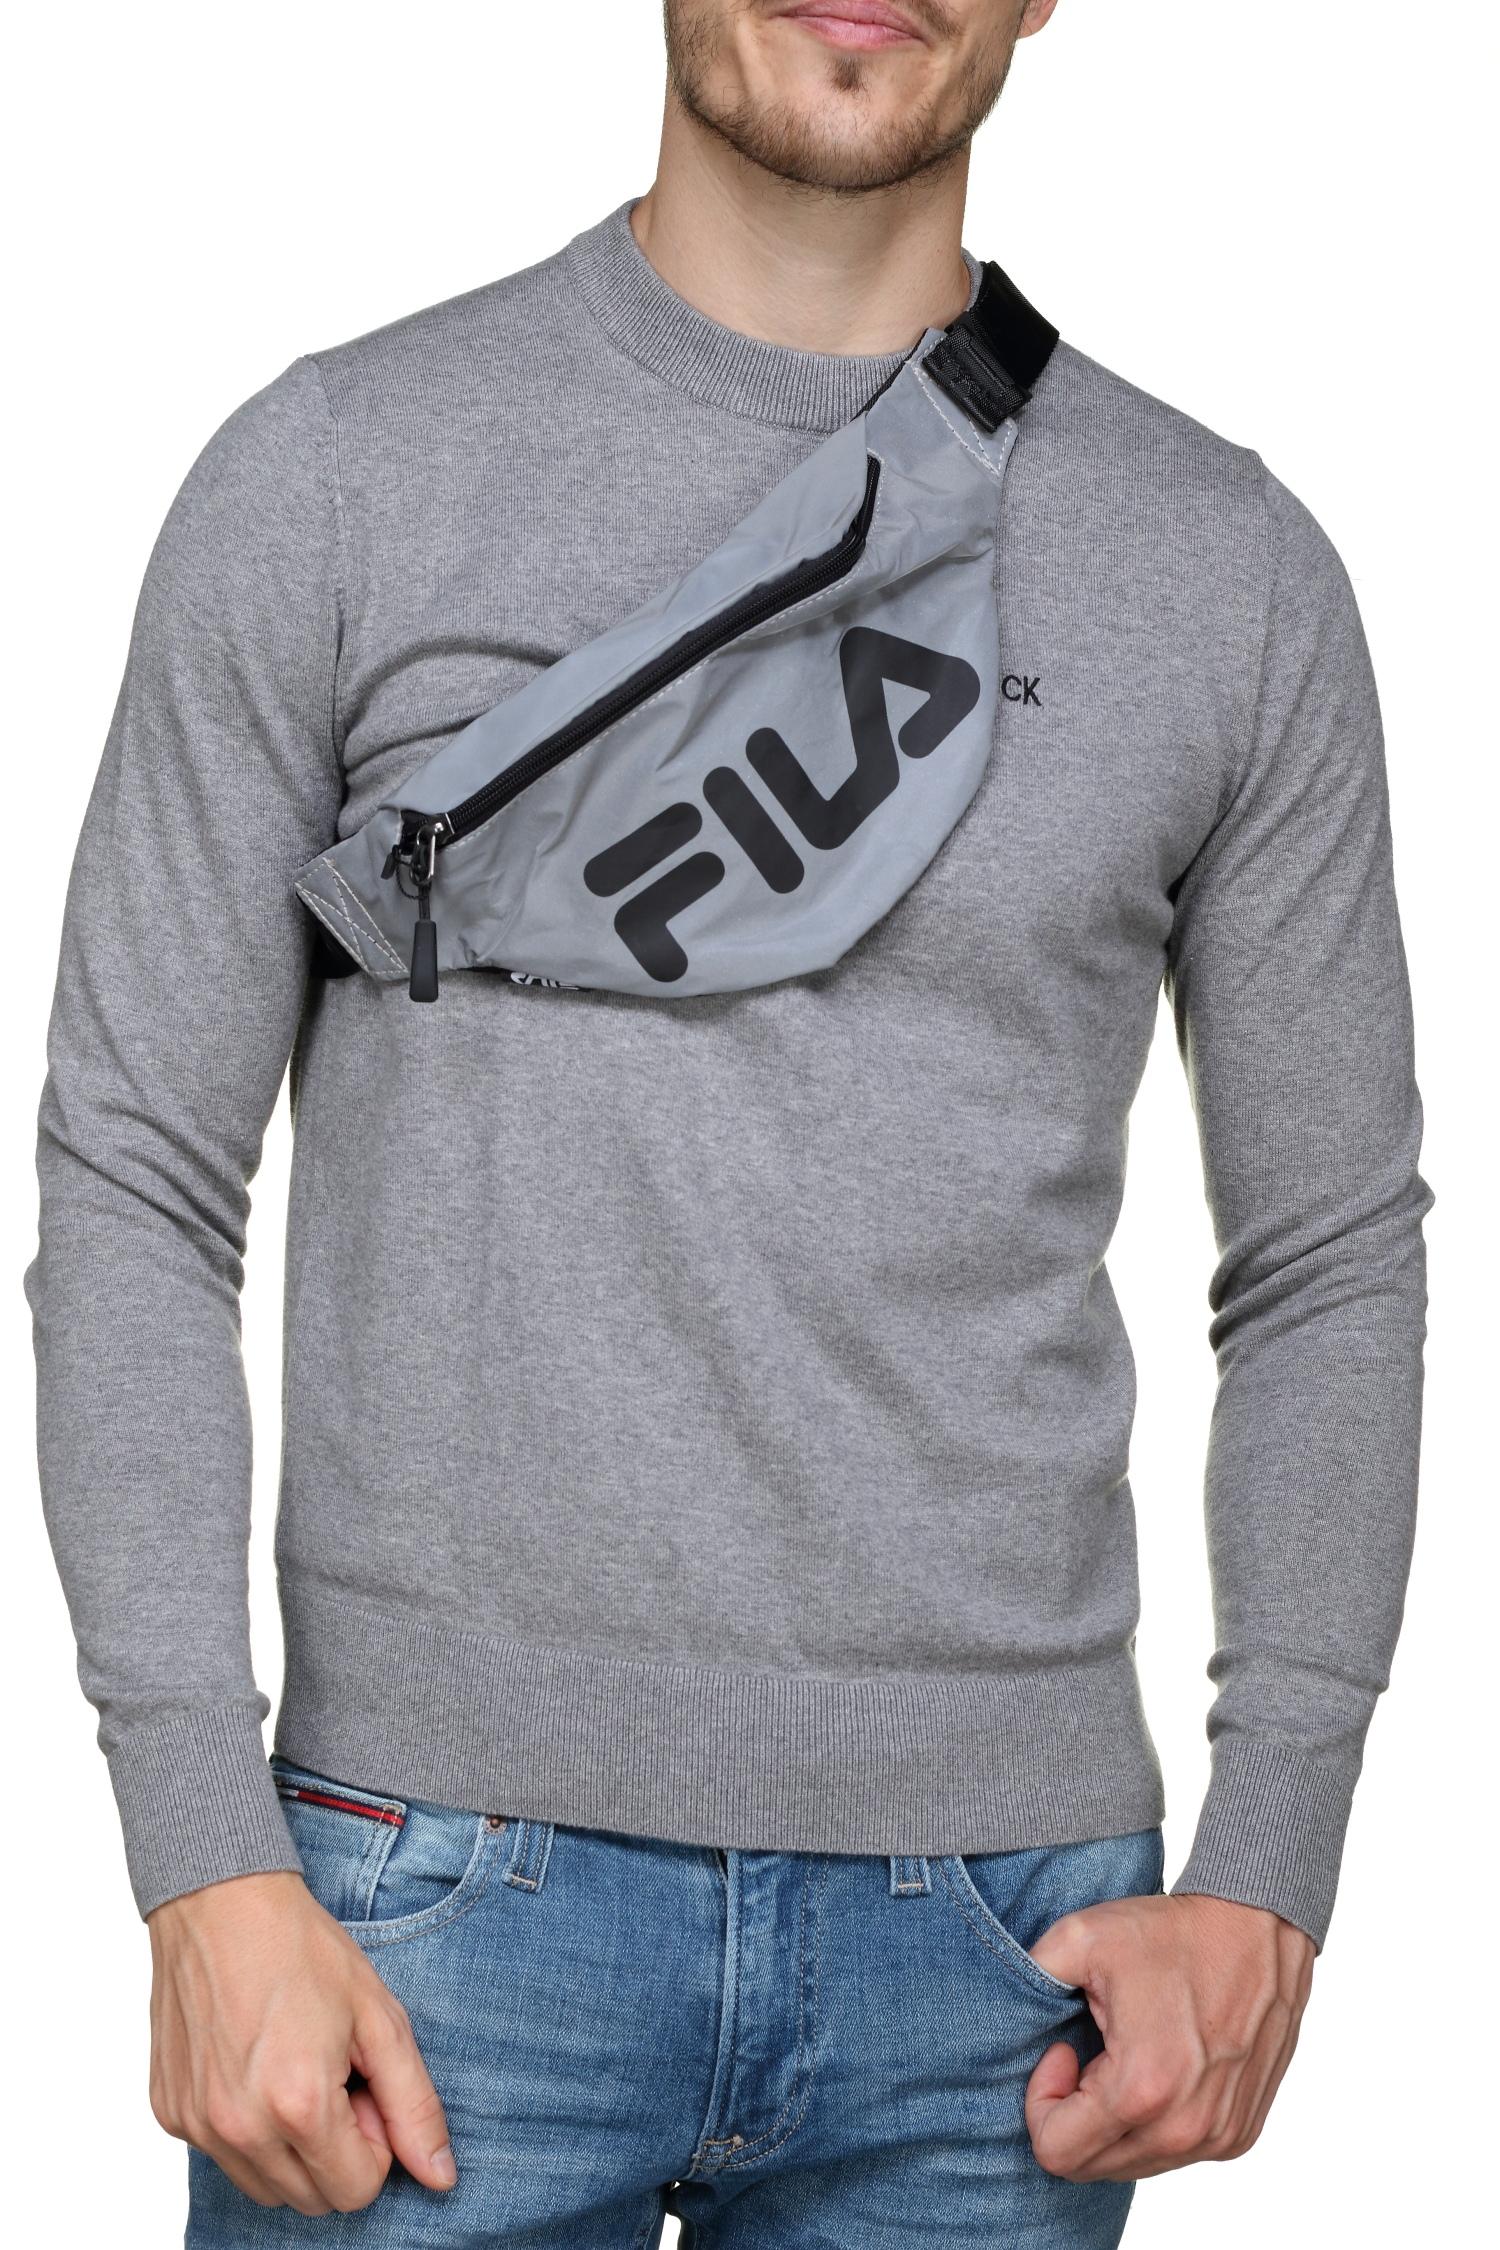 https://www.leadermode.com/176452/fila-685103-waist-bag-reflecti-j99-silver.jpg